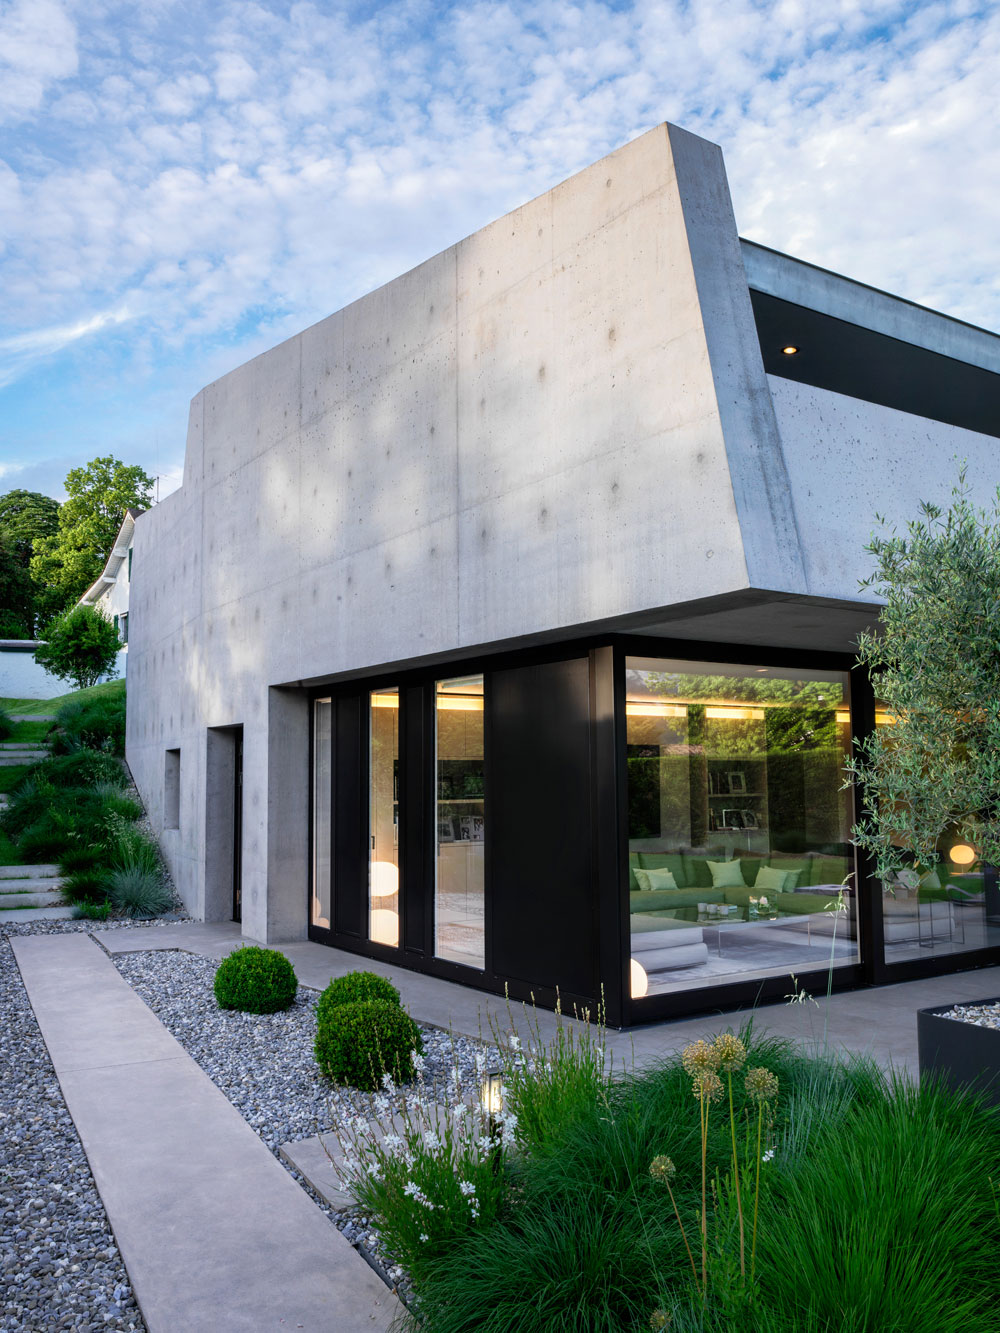 2LB House by Raphaël Nussbaumer Architectes (3)